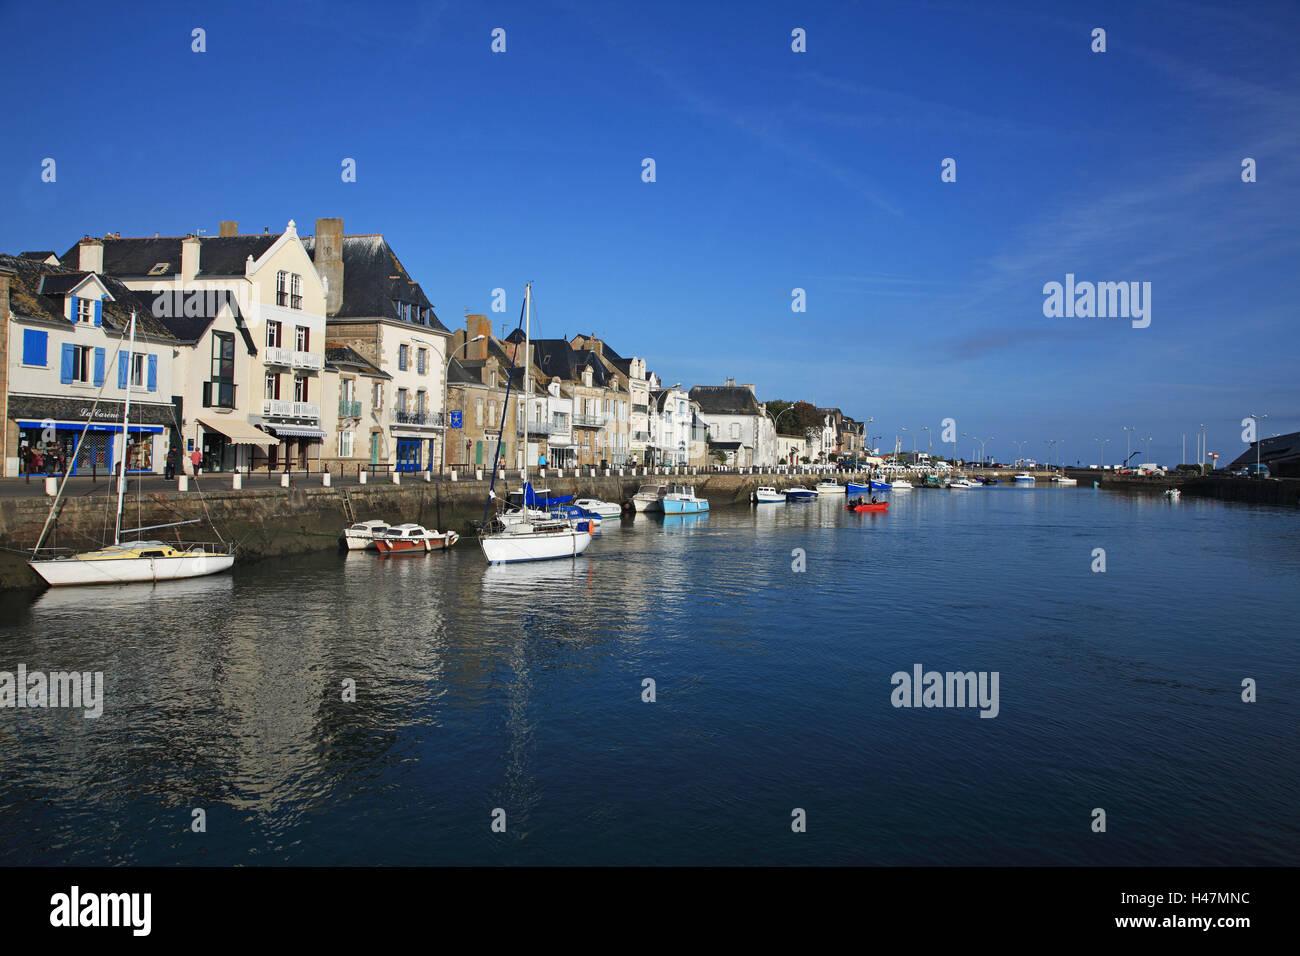 France, Brittany, Loire-Atlantique, canton Le Croisic, harbour, boots, Europe, architecture, houses, buildings, Stock Photo